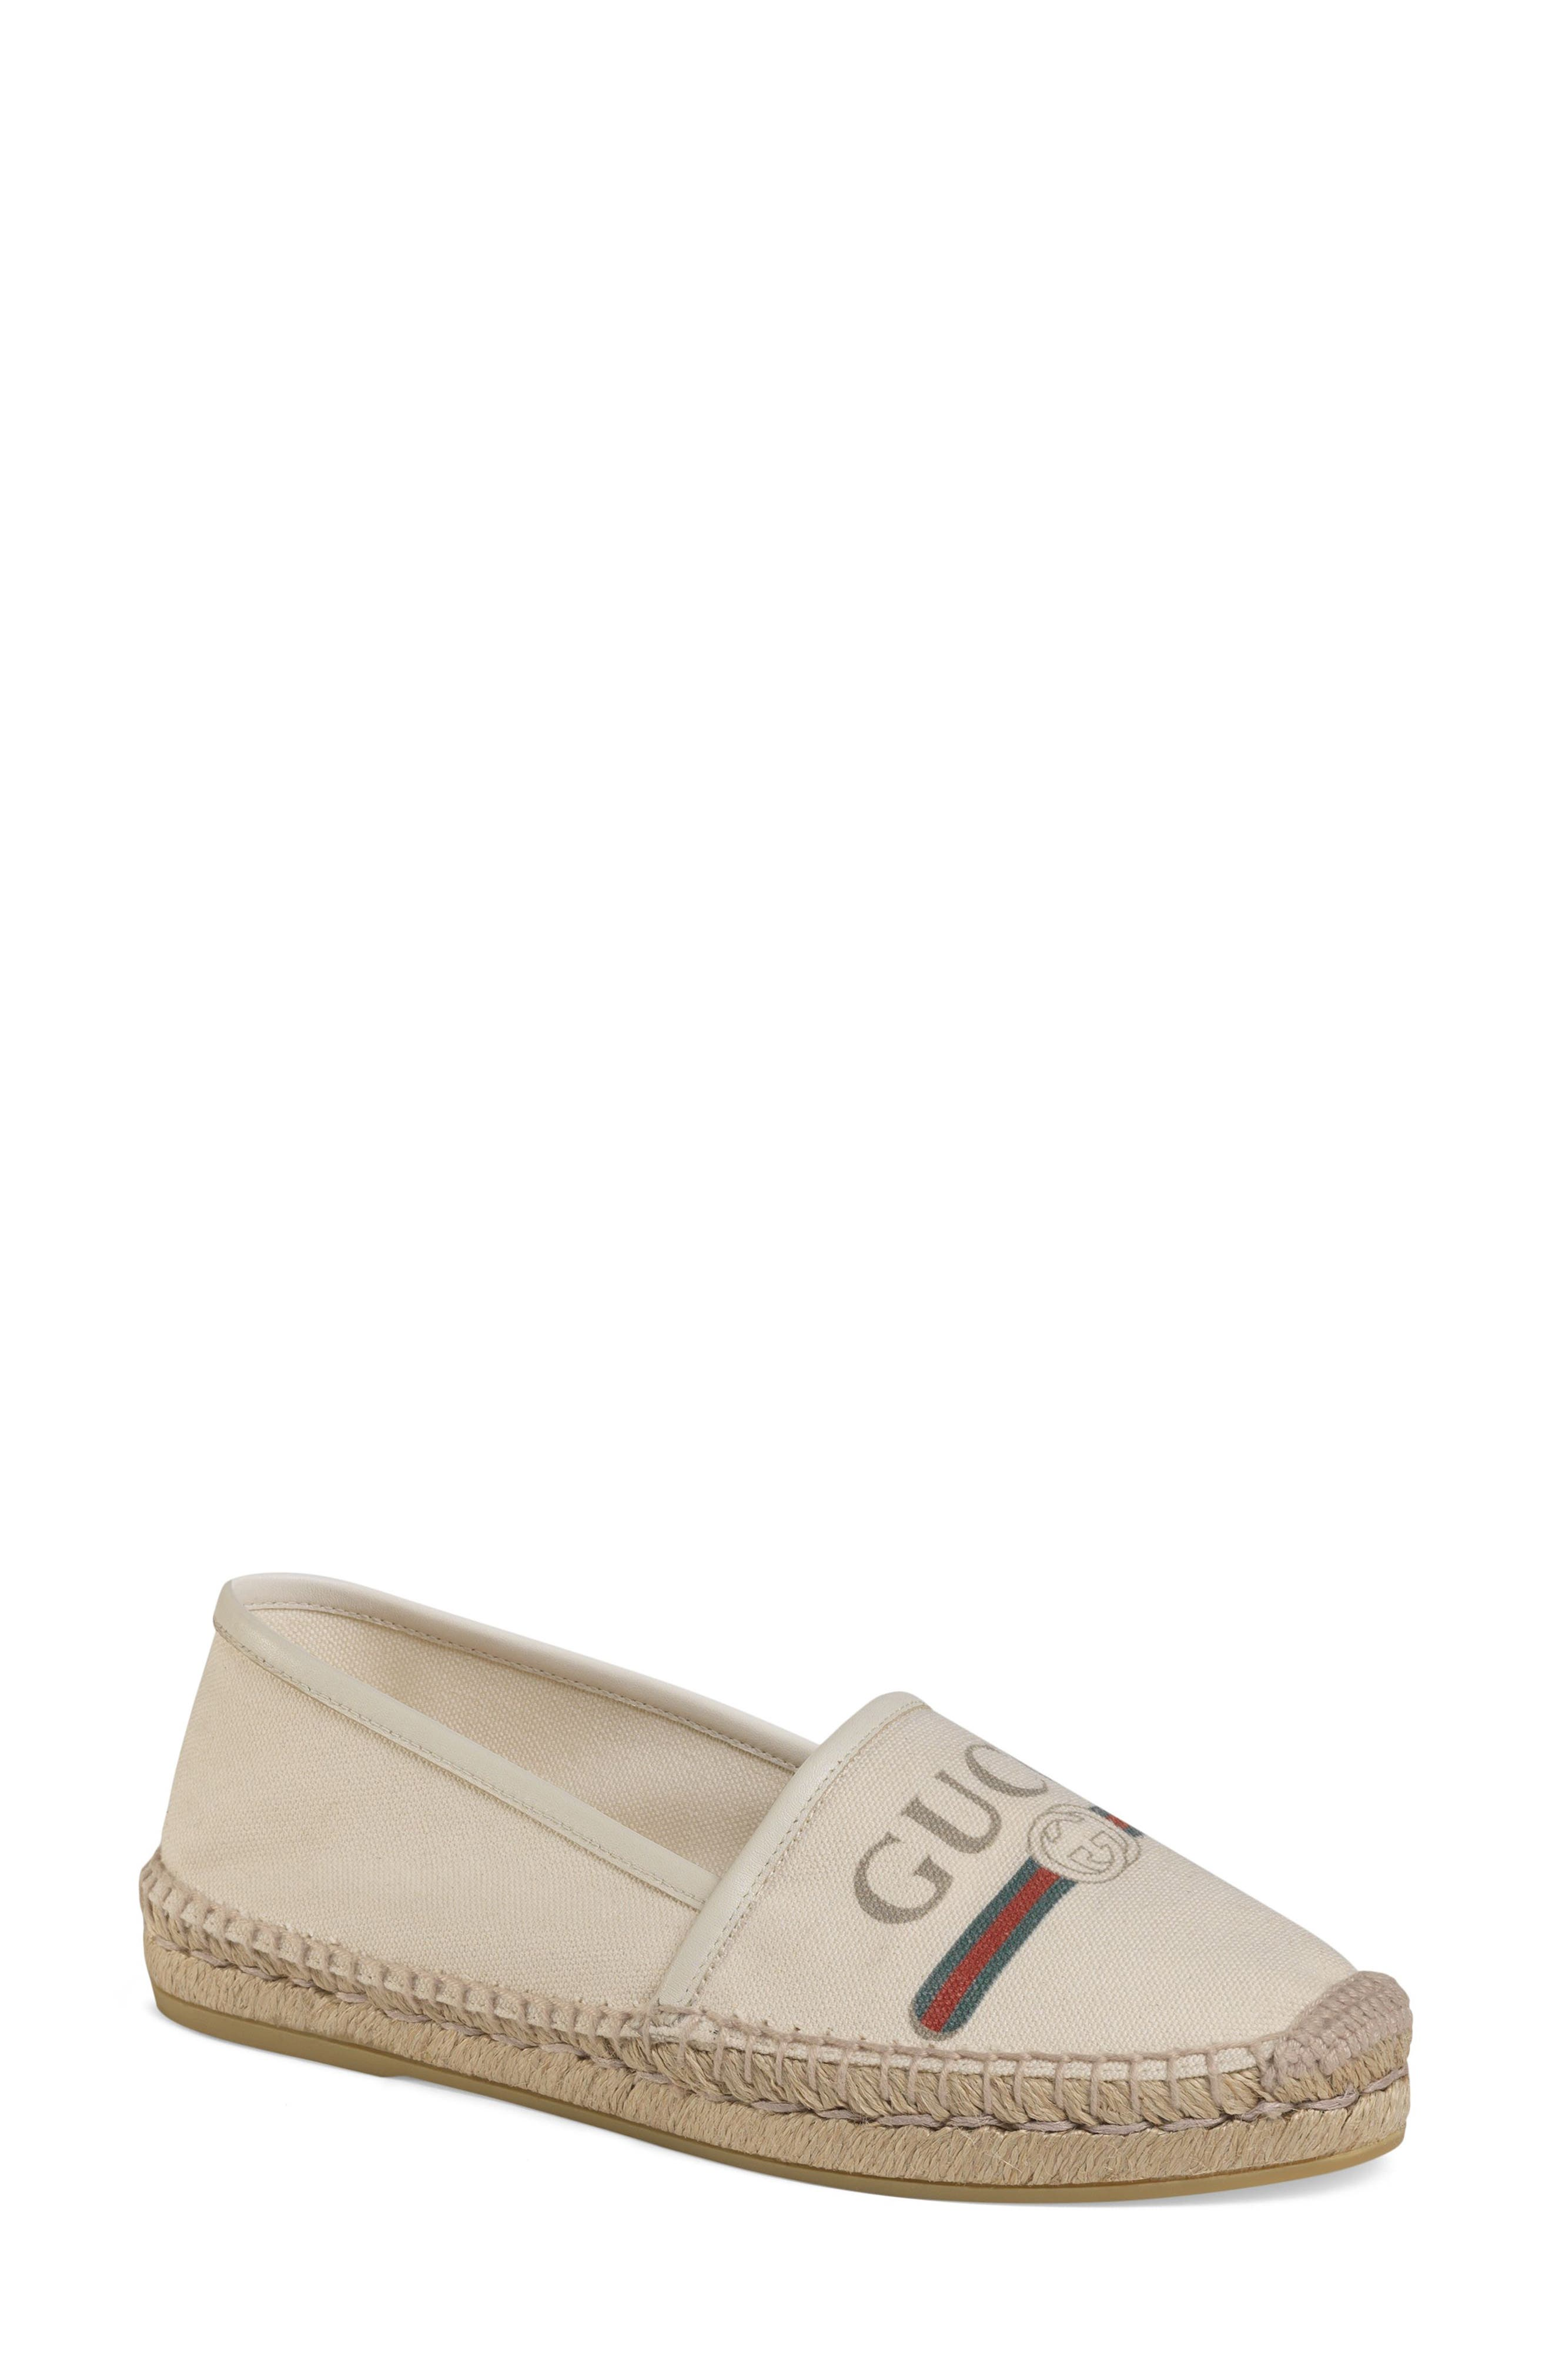 Gucci Logo Espadrille Flat, White